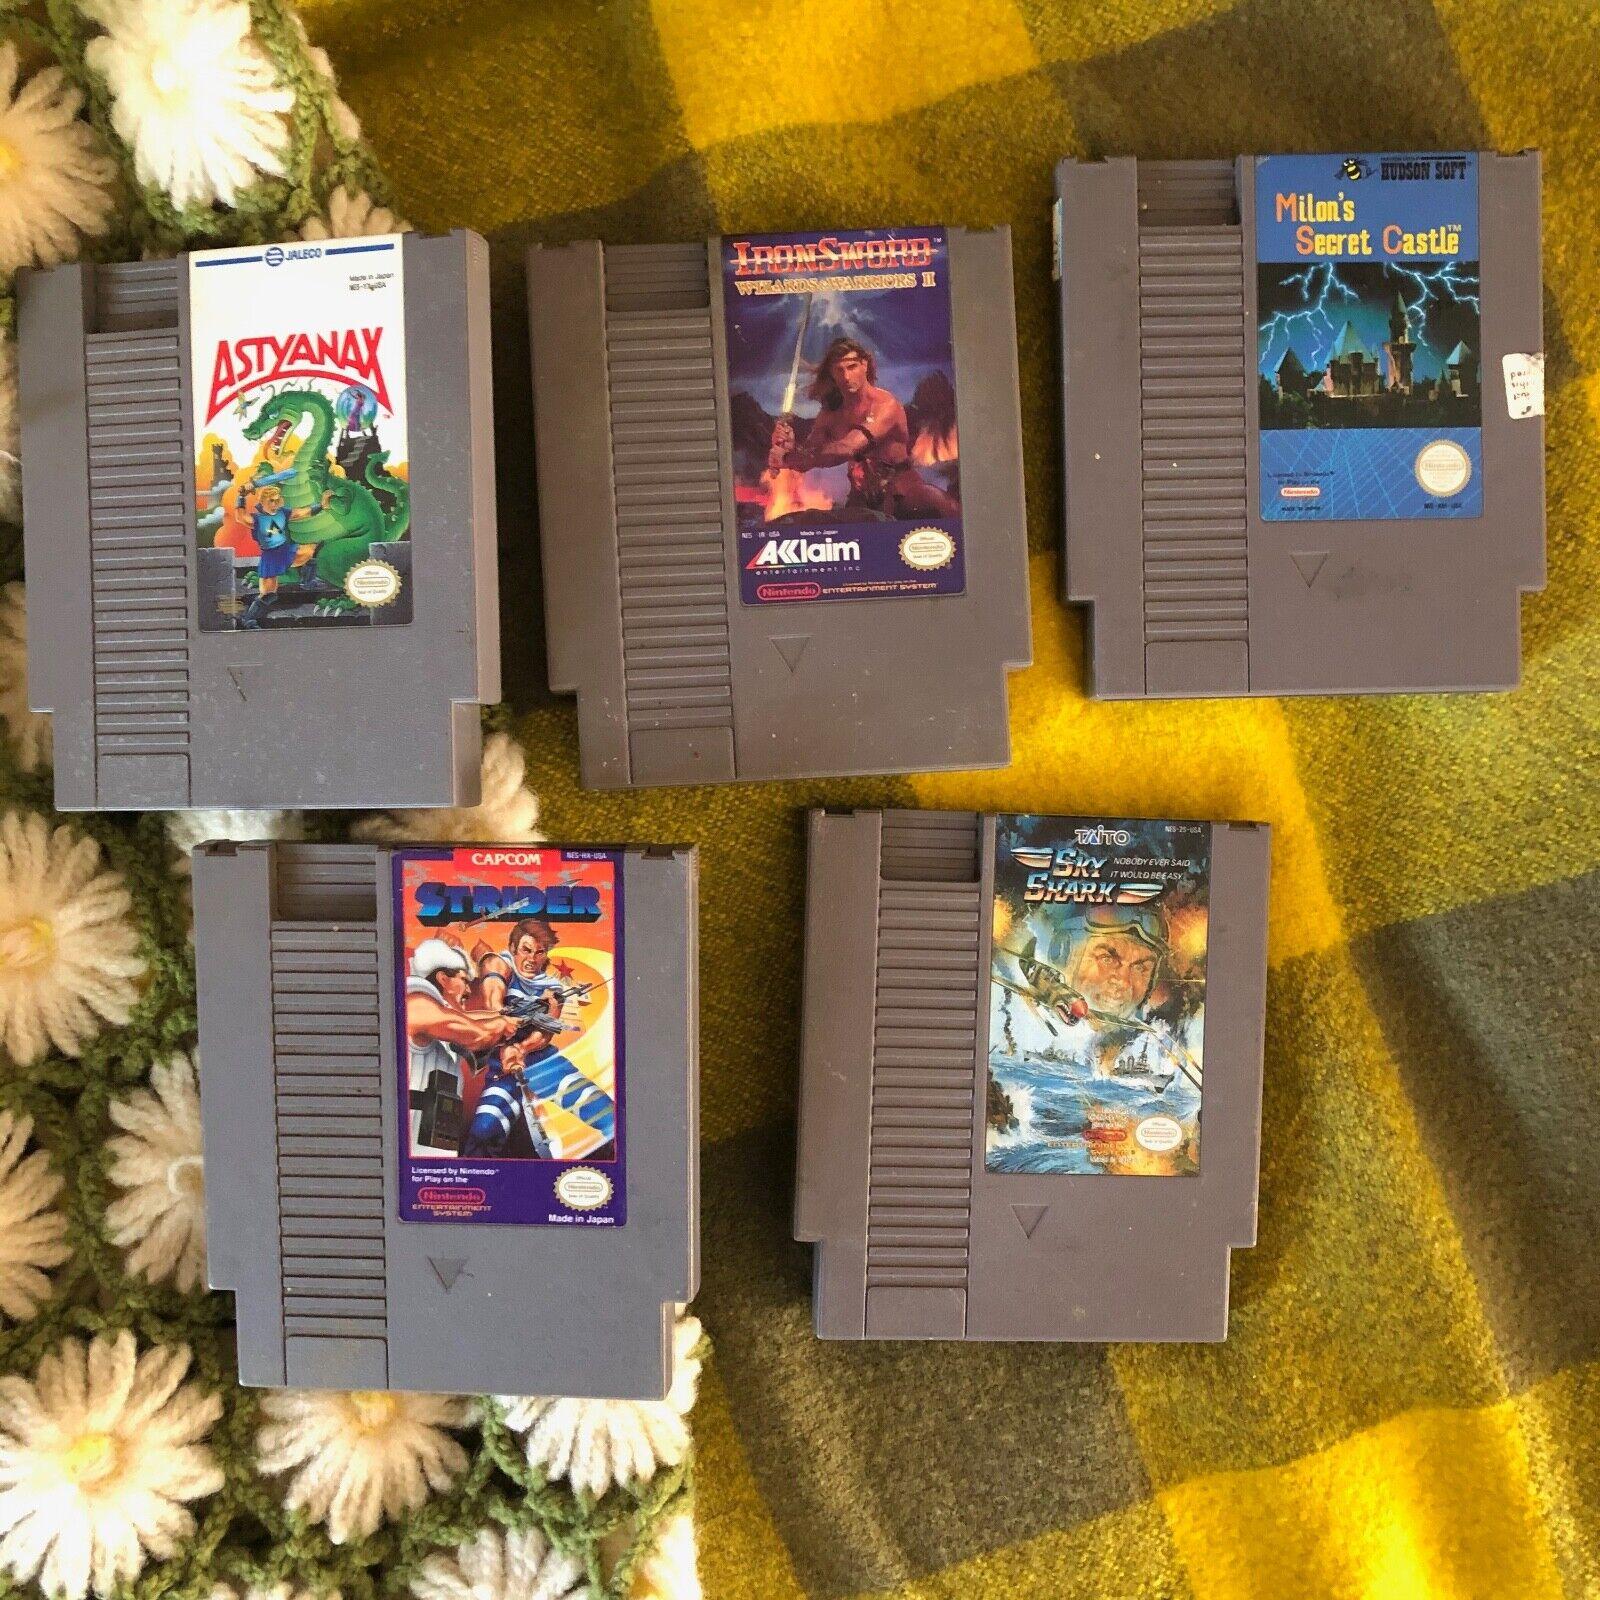 Lot Of 5 NES Games Strider Astynax Nintendo Entertainment System Iron Sword Sky - $20.00